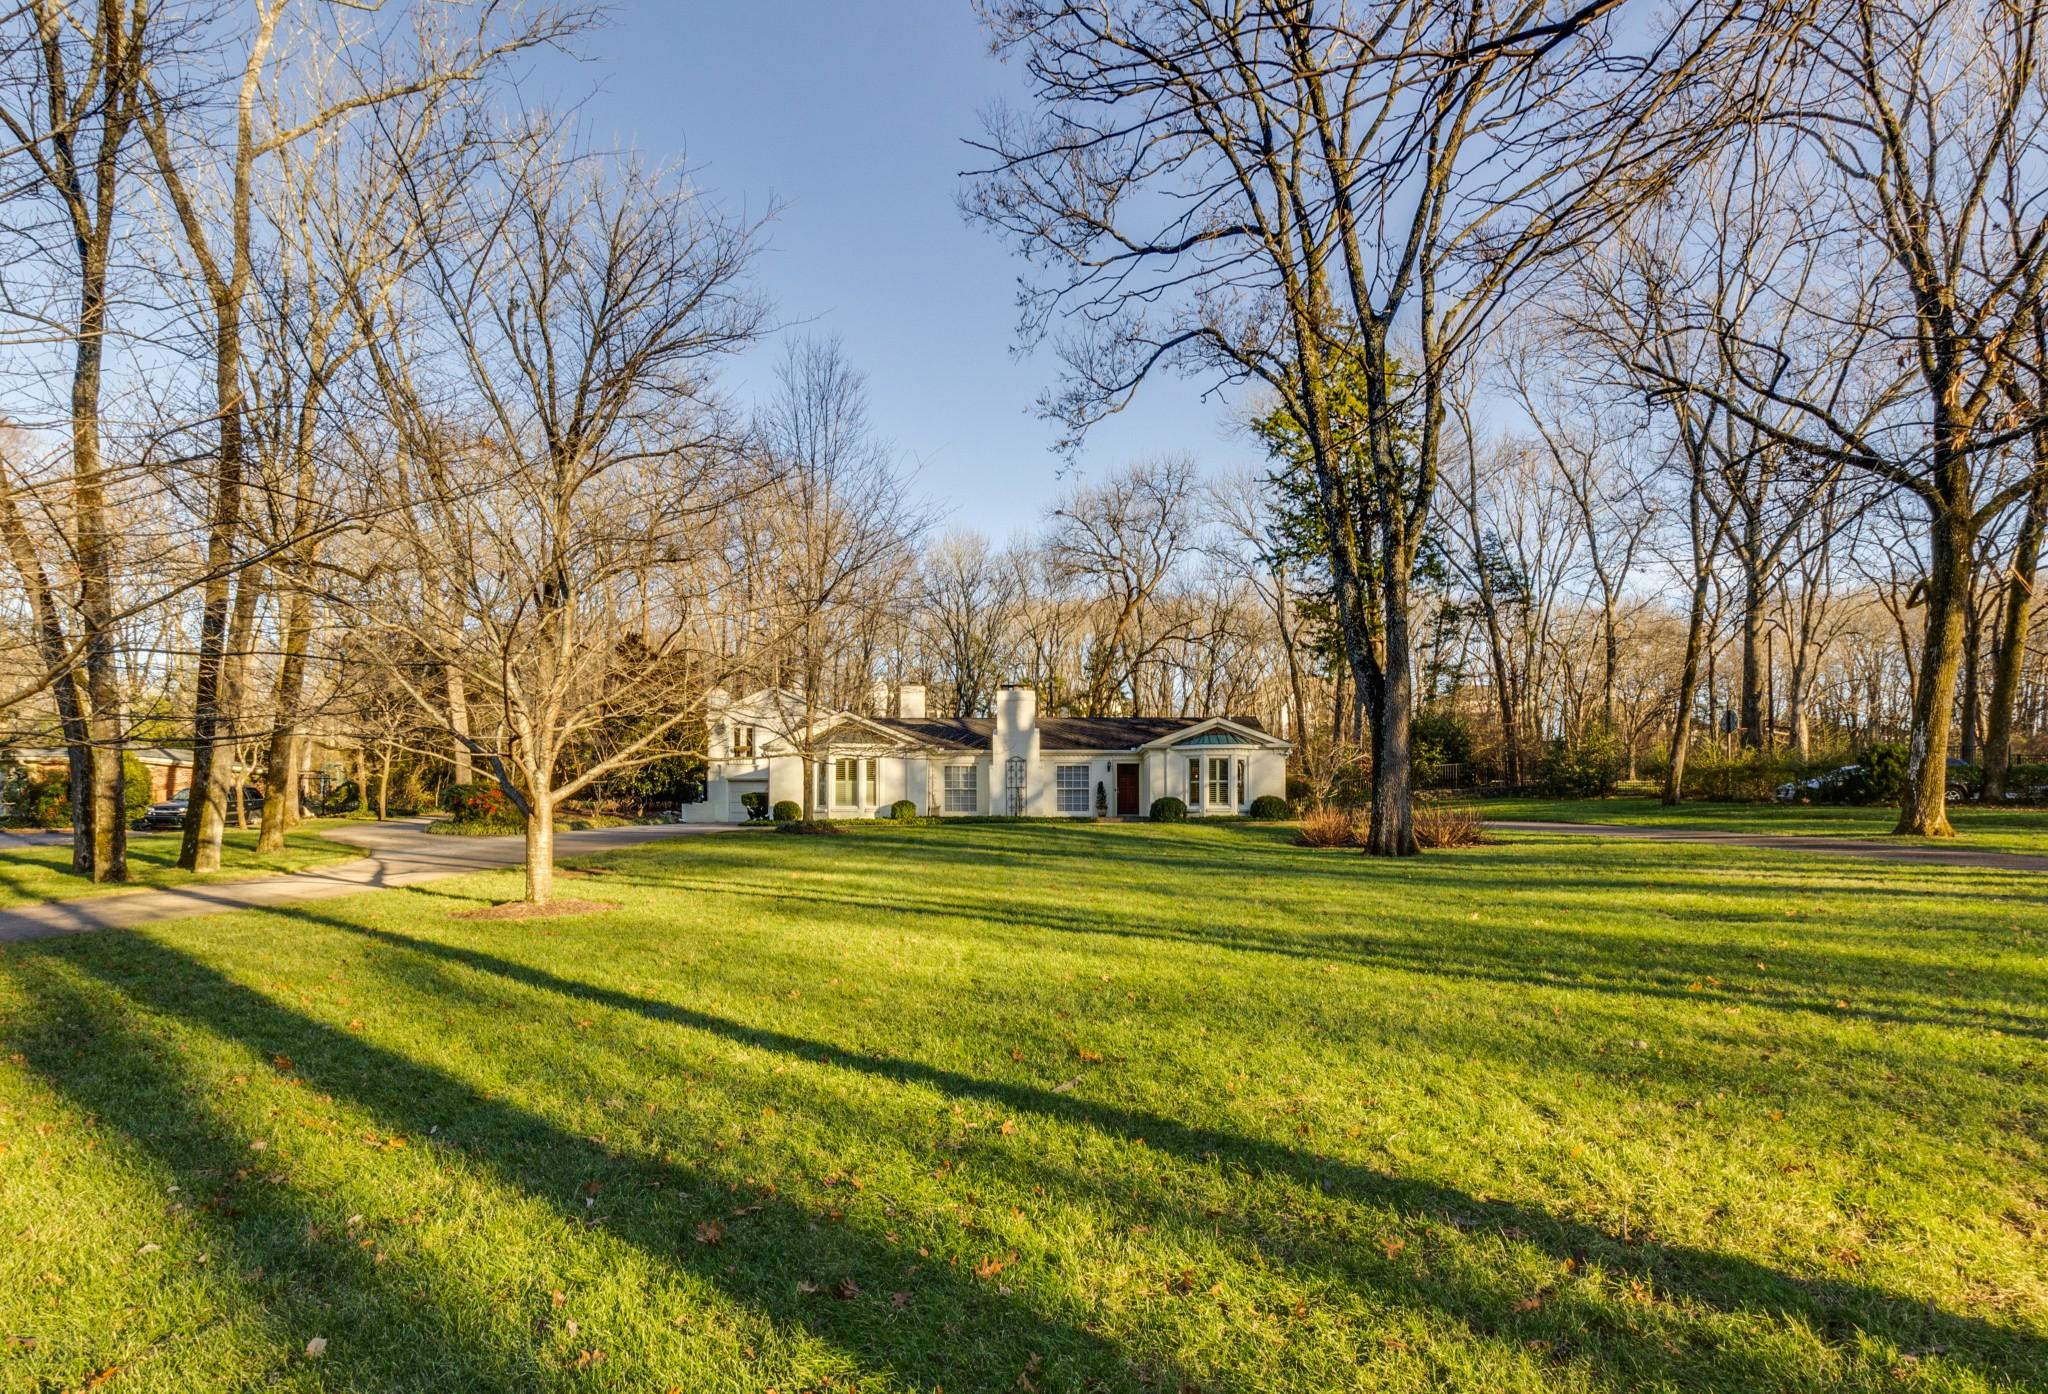 606 Lynnwood Blvd, Nashville, TN 37205 - Nashville, TN real estate listing